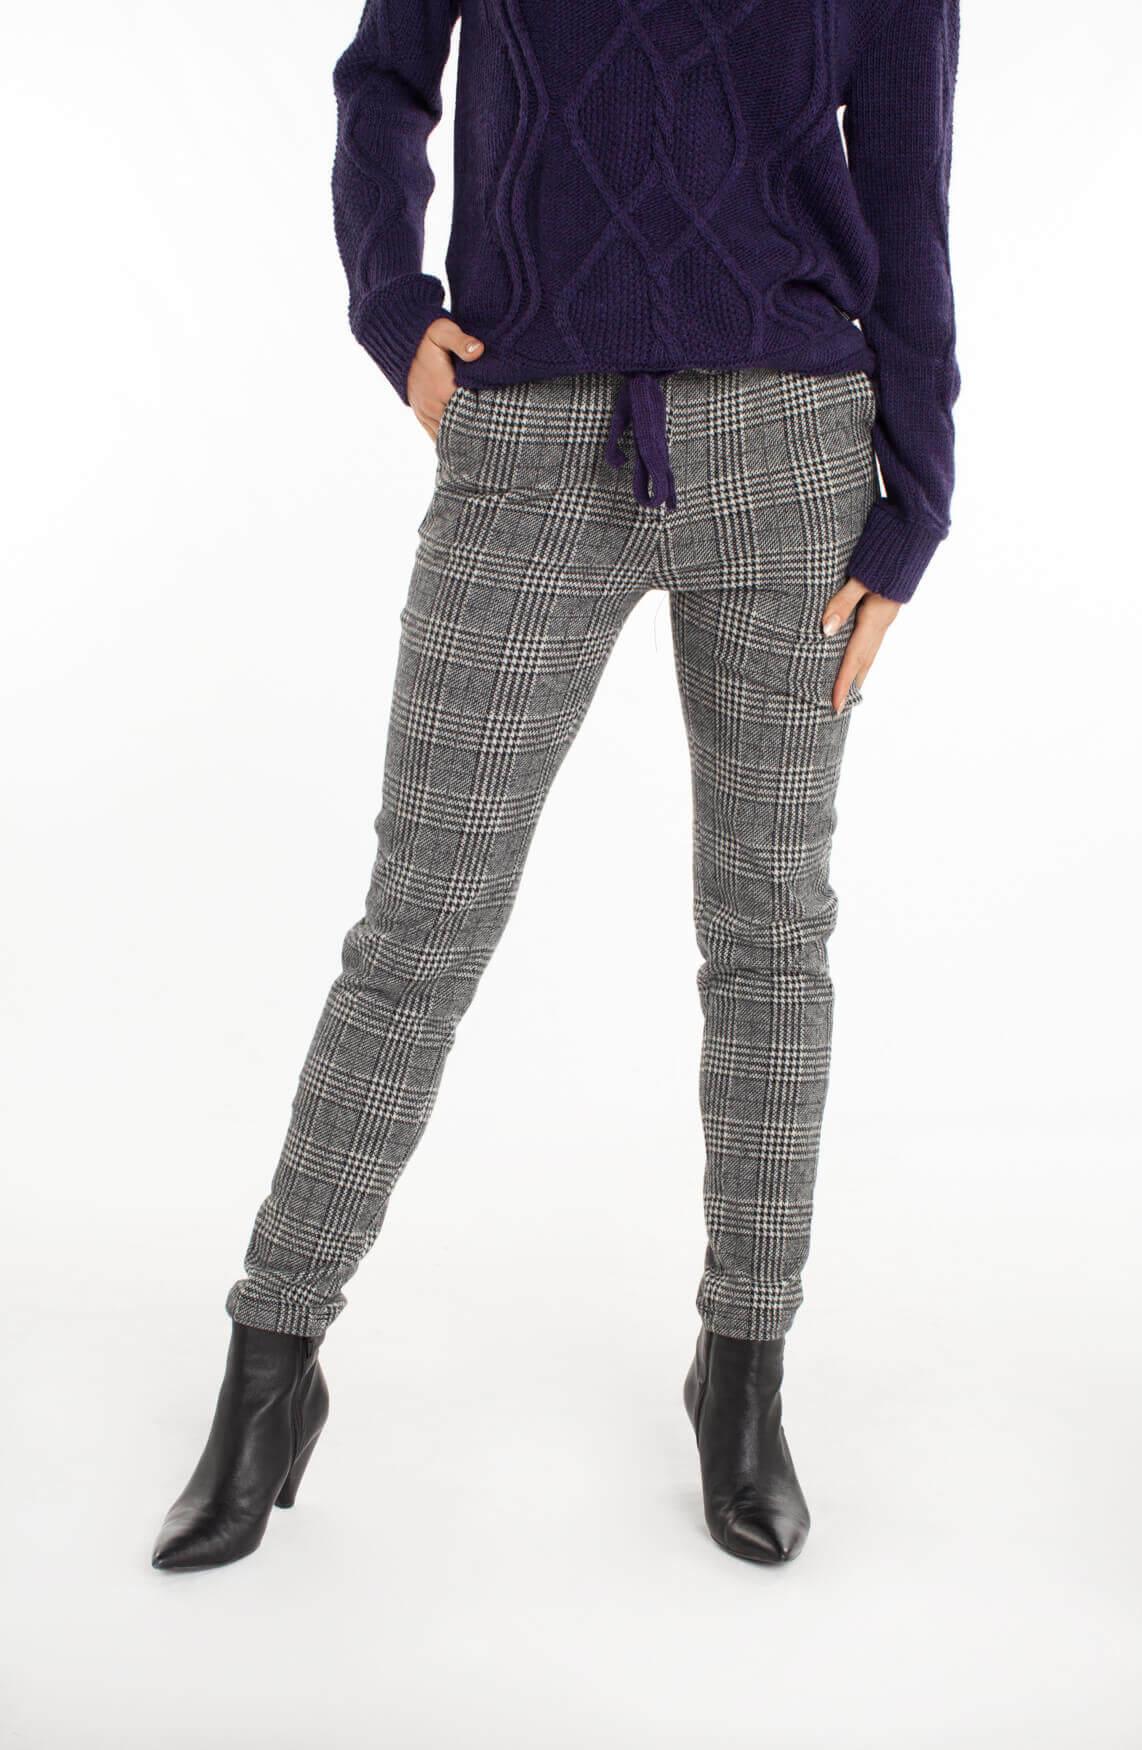 Penn & Ink Dames Pied-de-poule broek zwart